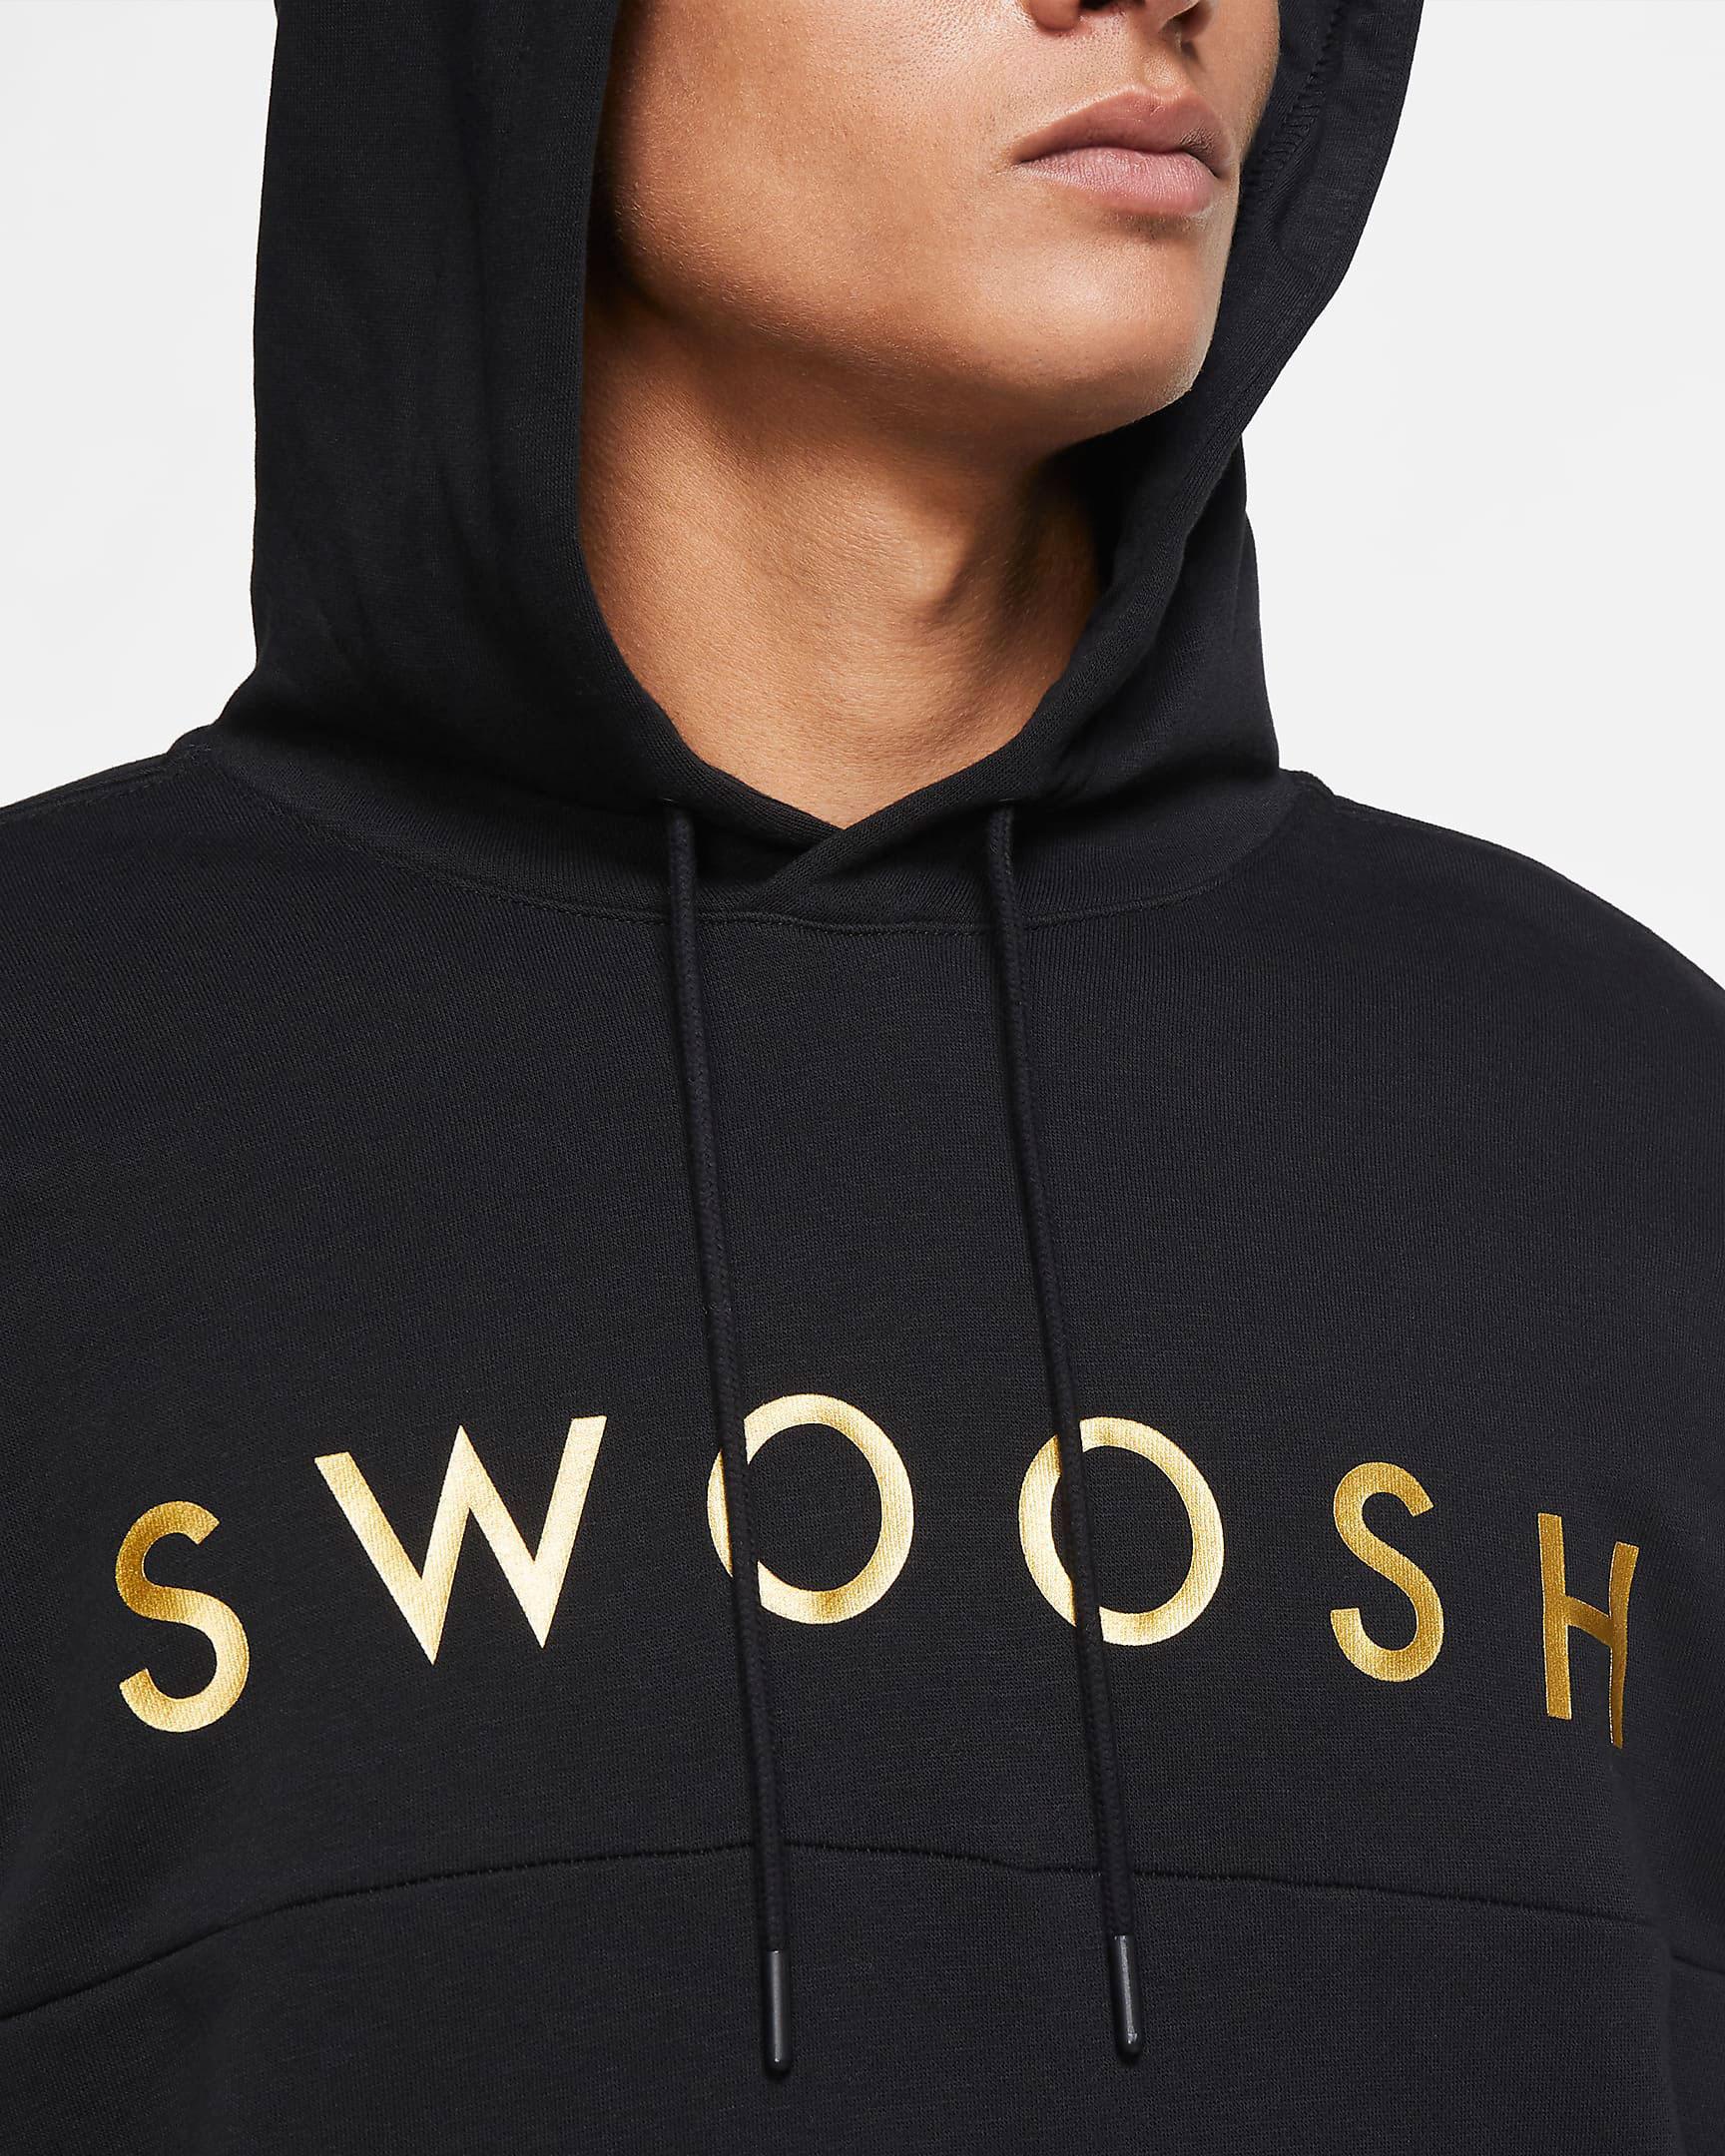 nike-sportswear-swoosh-hoodie-black-metallic-gold-3